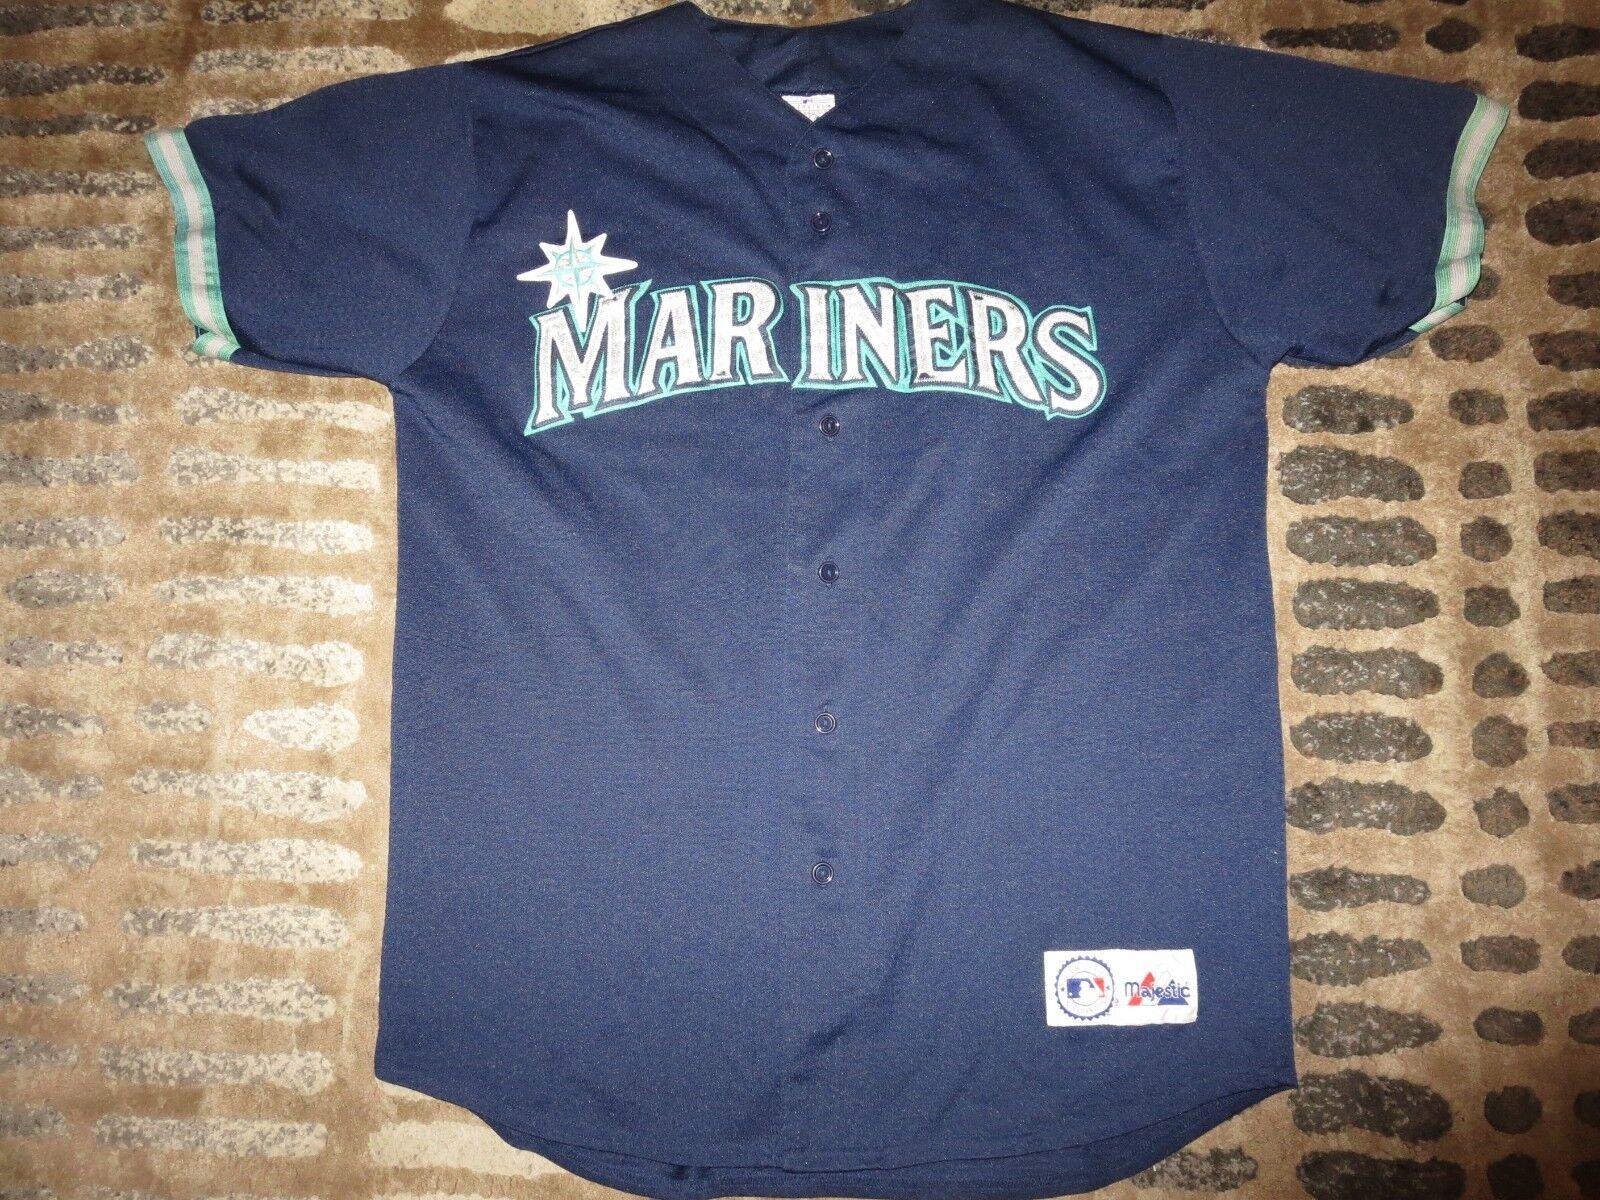 Seattle Mariners L Majestic Majestic Premier Sewn MLB Jersey LG L Mariners Uomo 2f92ef